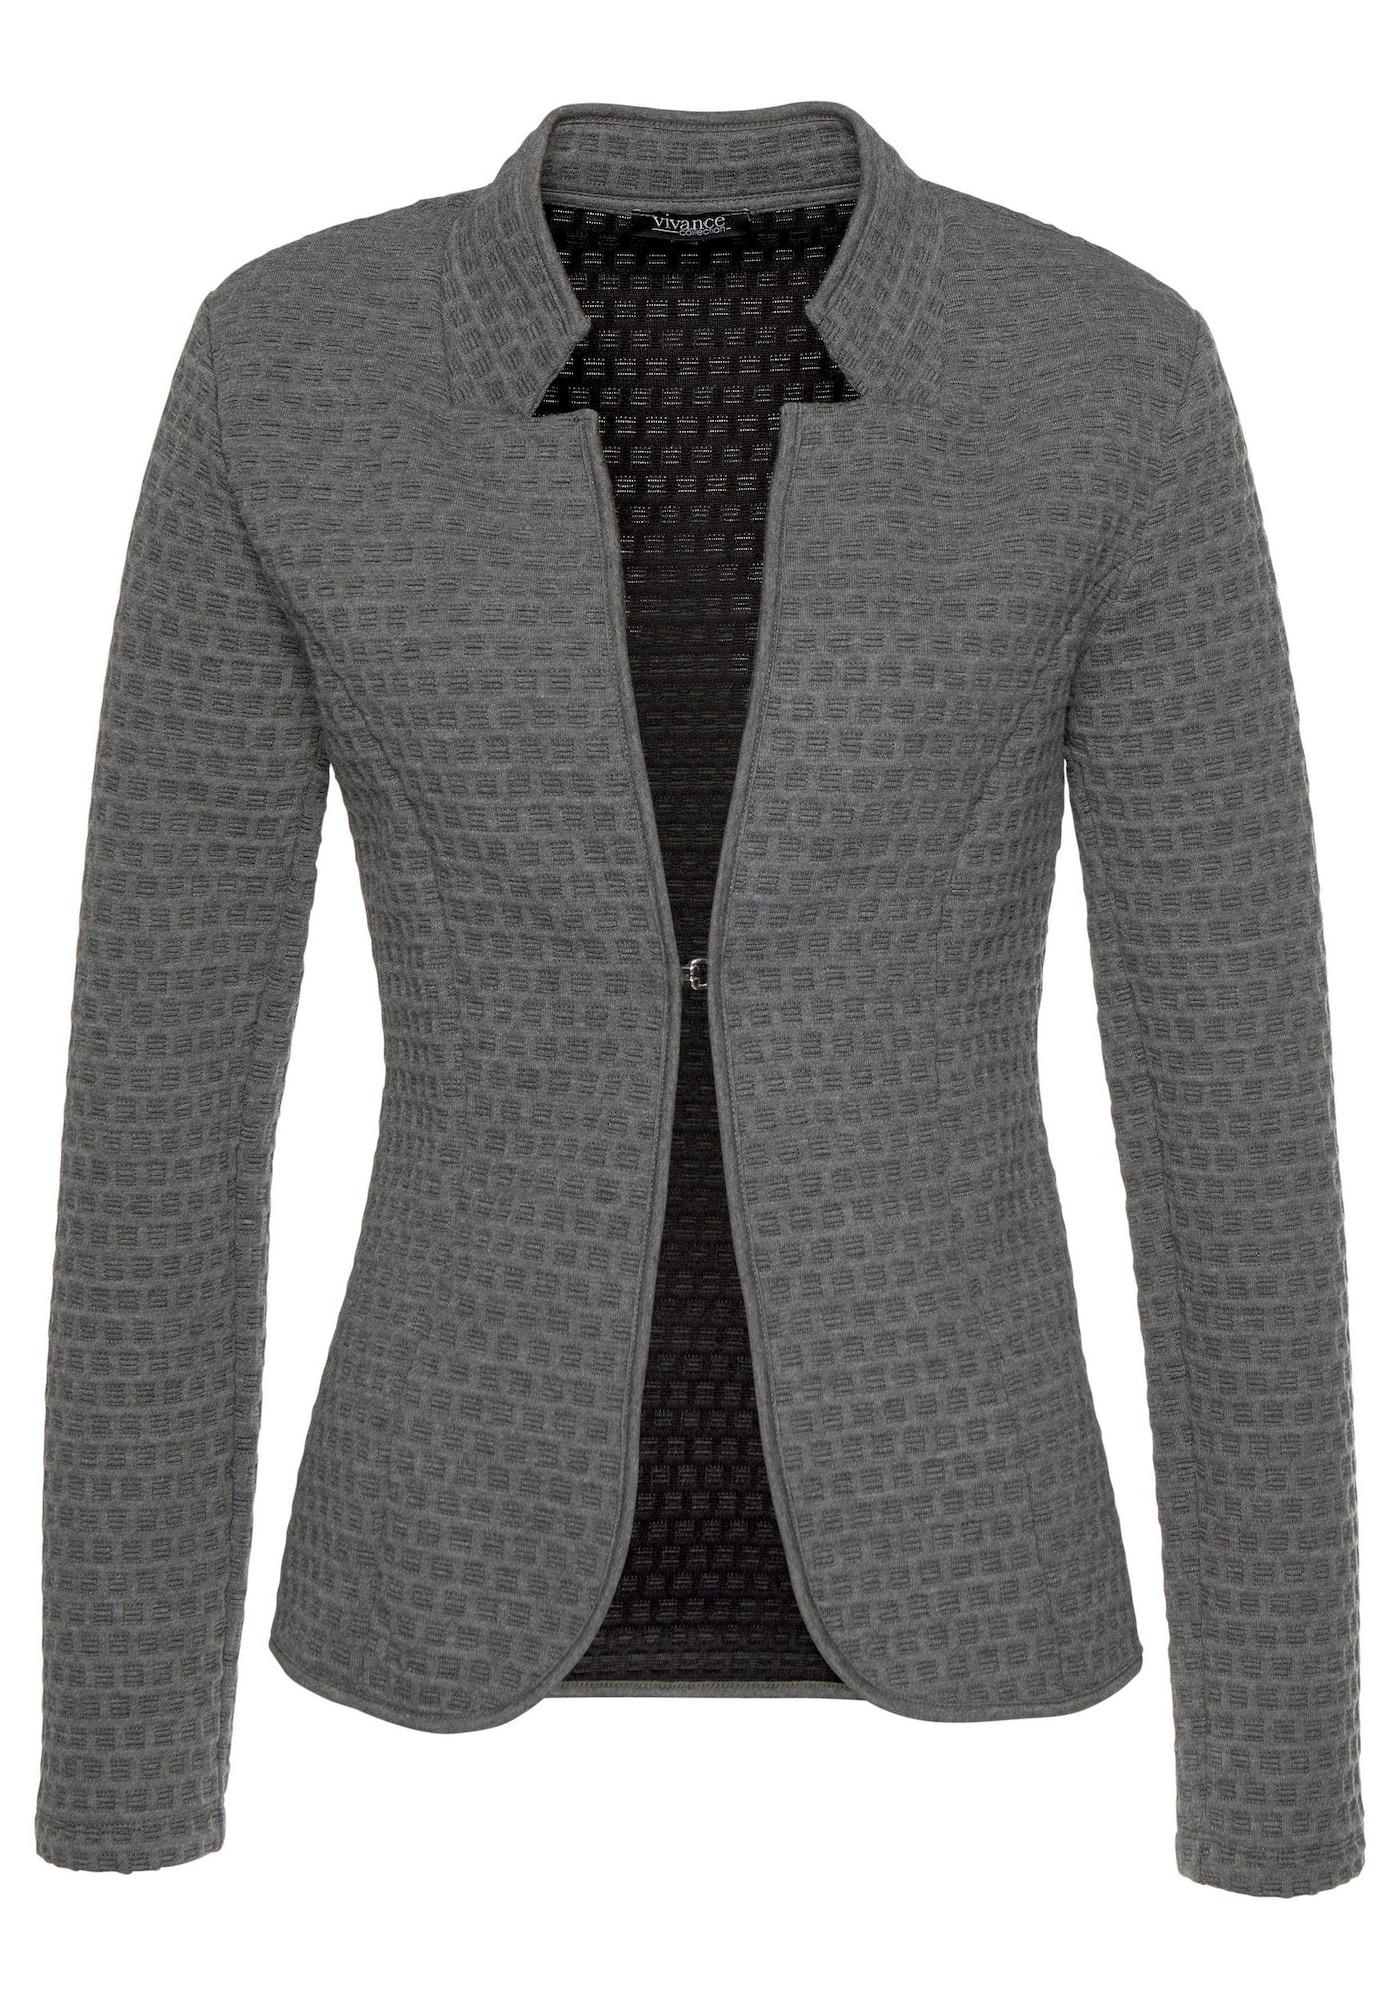 Jackenblazer | Bekleidung > Blazer > Jackenblazer | VIVANCE